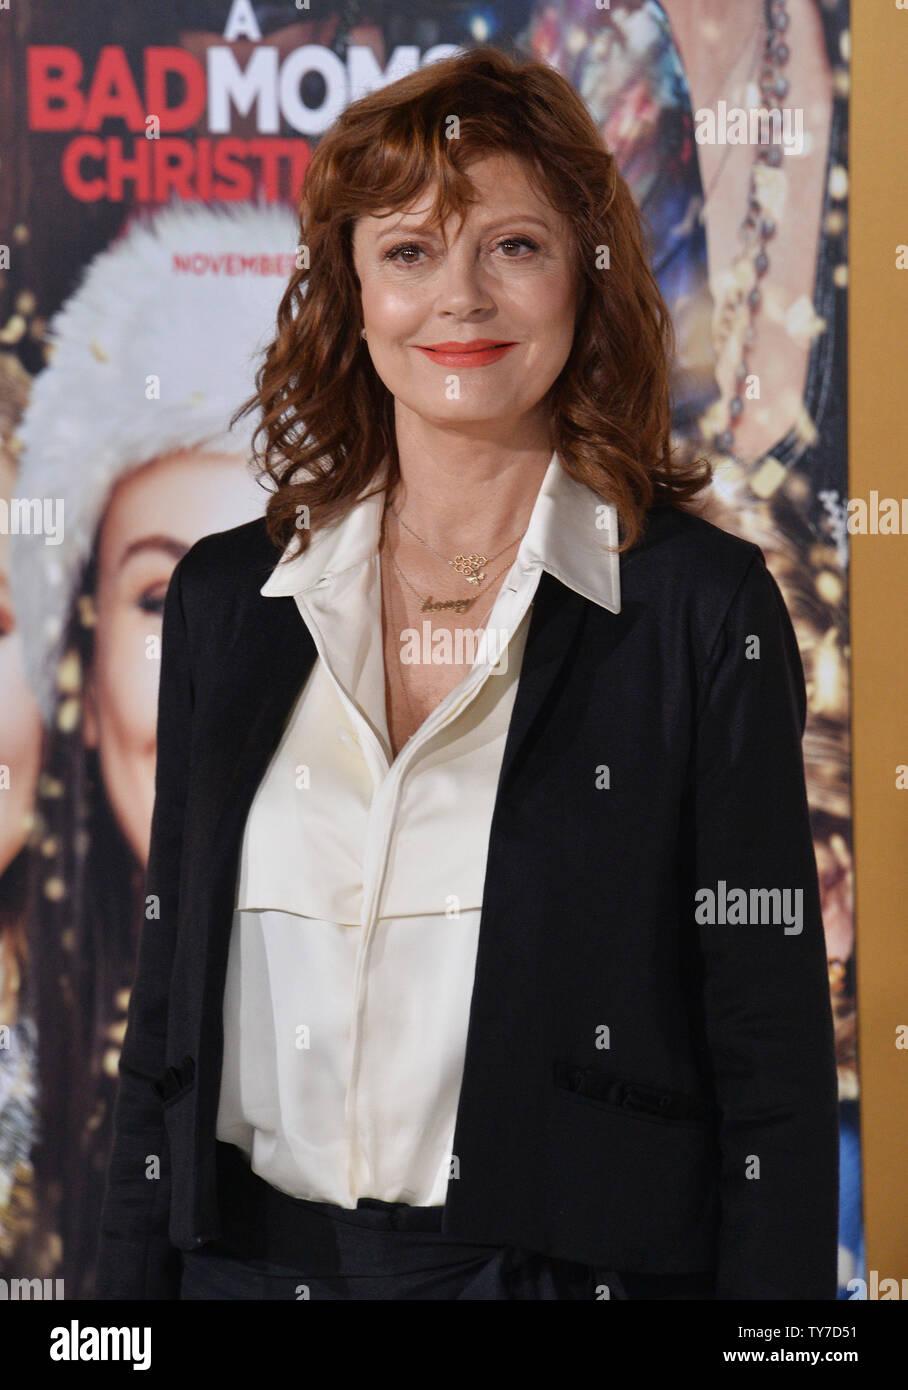 Bad Moms Christmas Susan Sarandon.Cast Member Susan Sarandon Attends The Premiere Of The